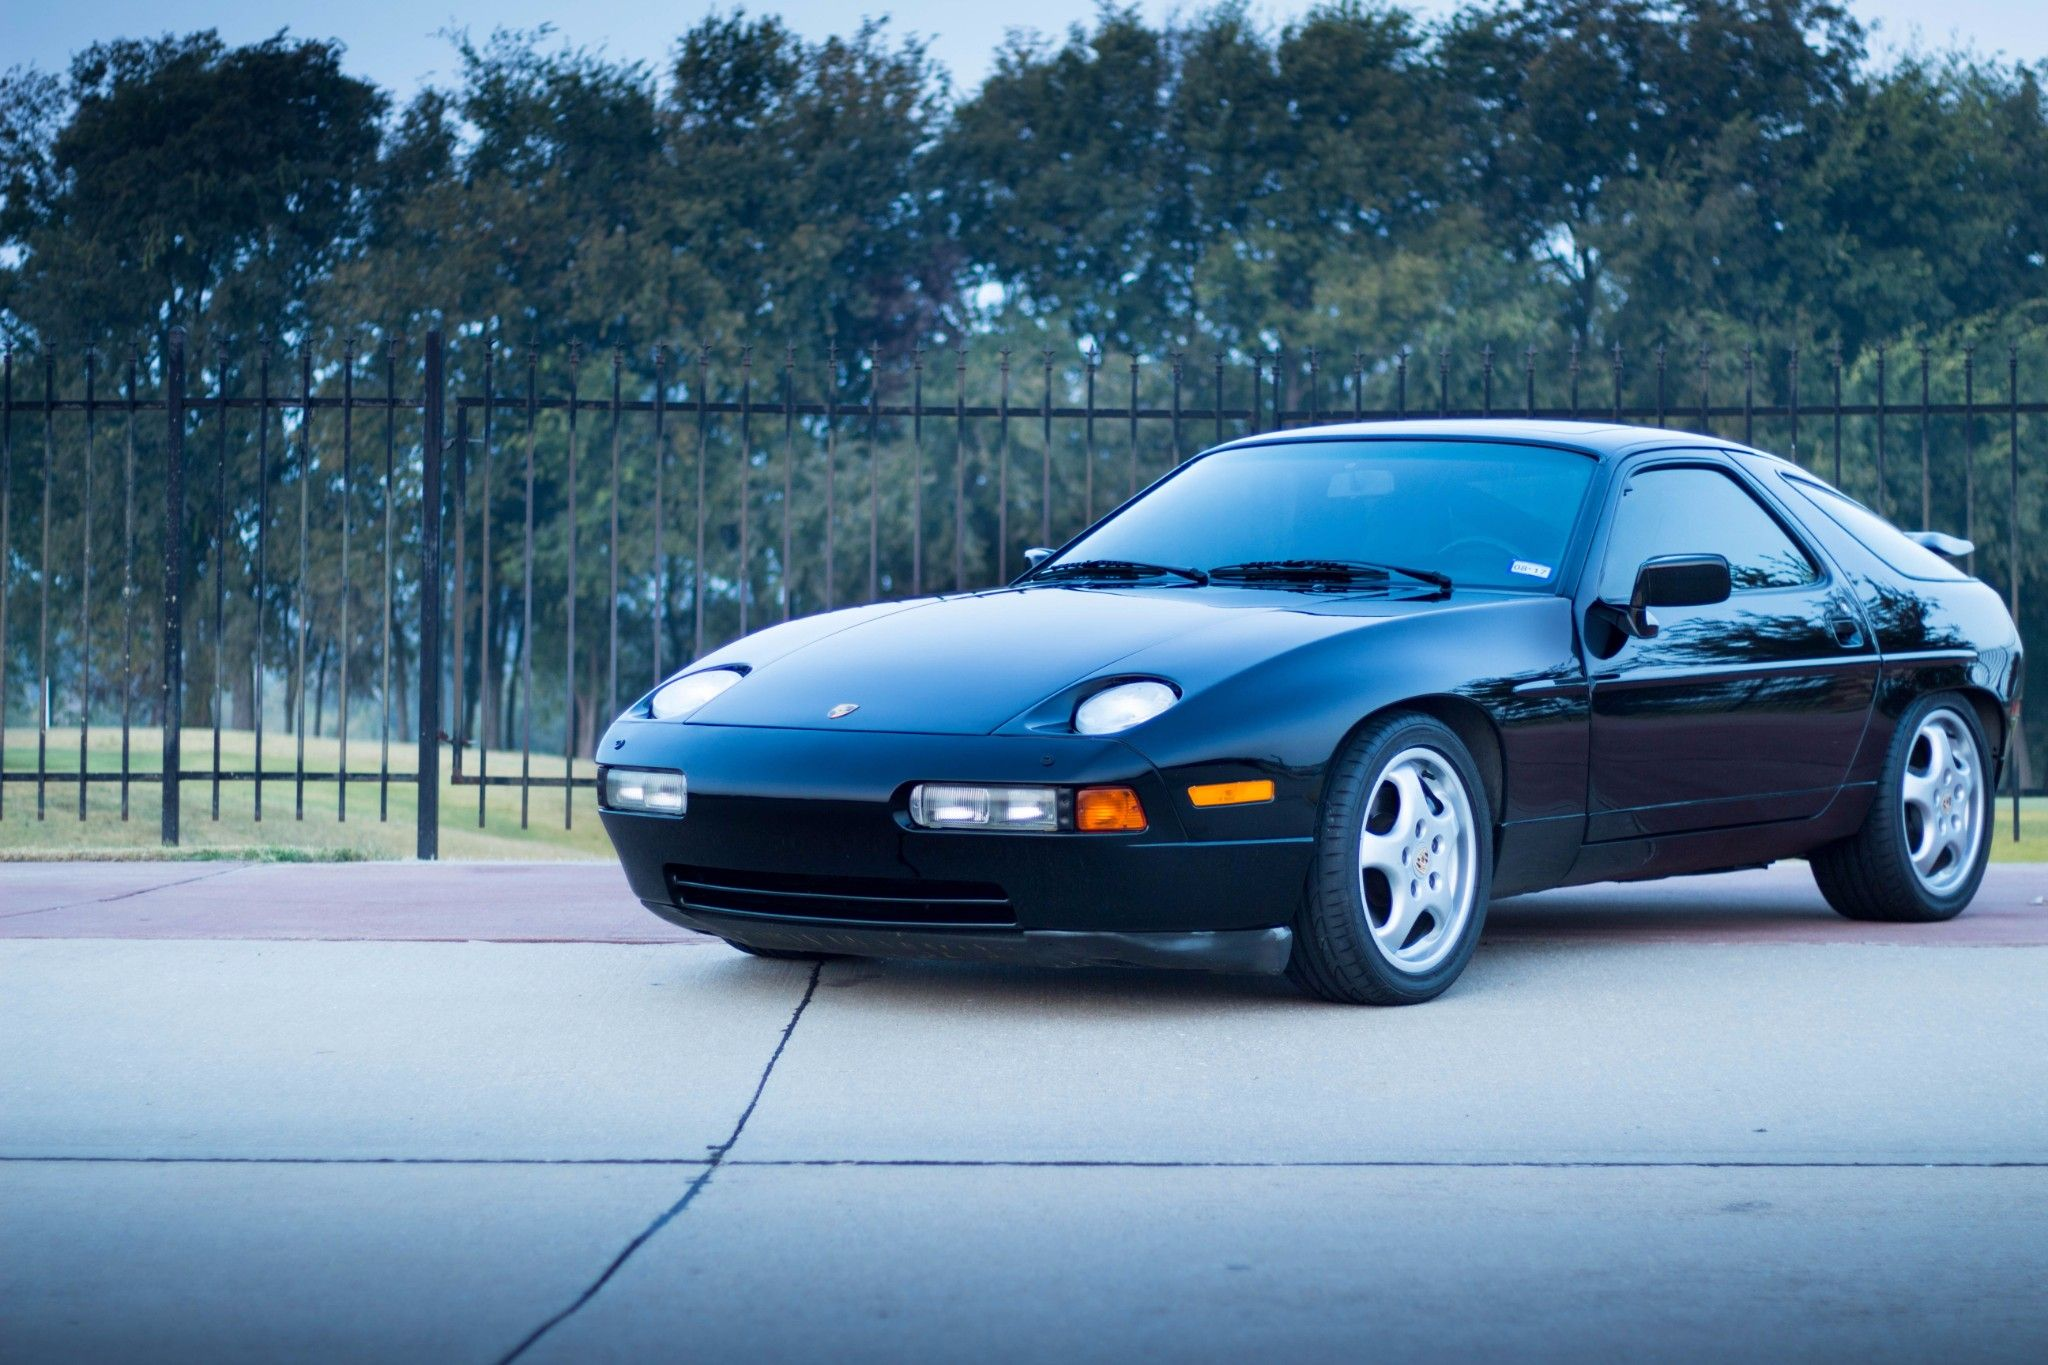 e Owner 1987 Porsche 928 S4 5 Speed for sale on BaT Auctions